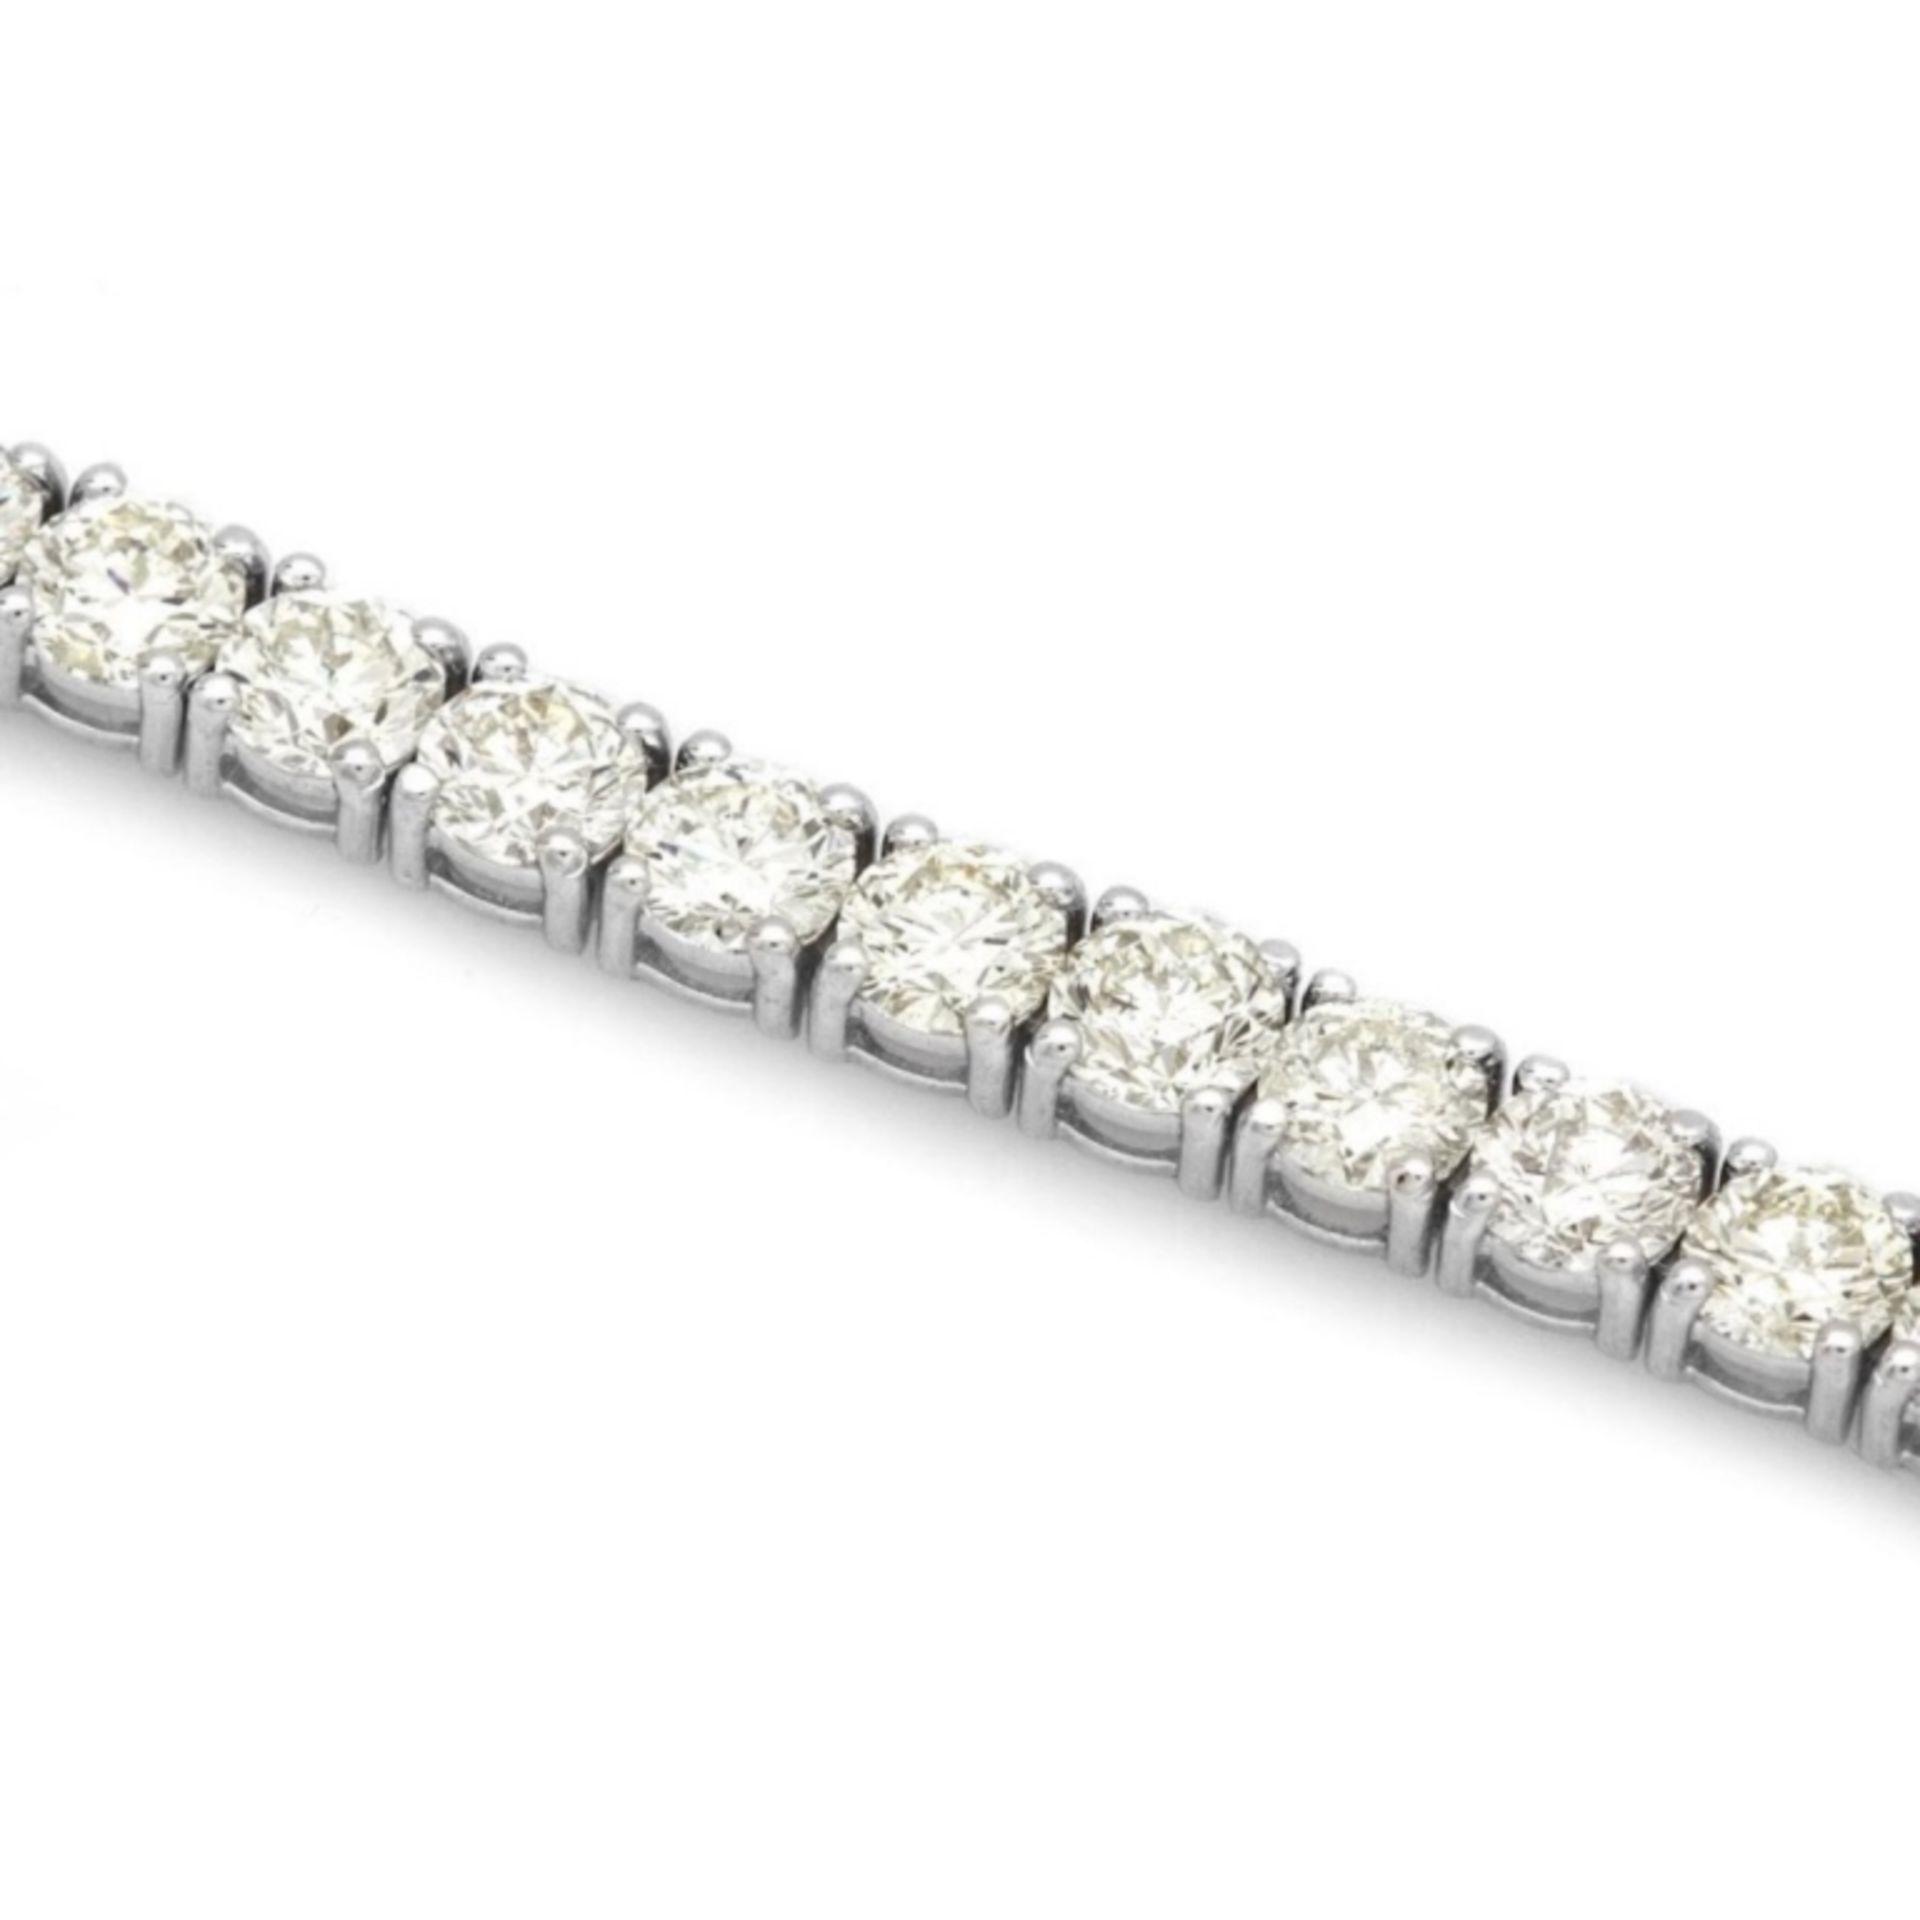 ^18k White Gold 12.00ct Diamond Tennis Bracelet - Image 3 of 4